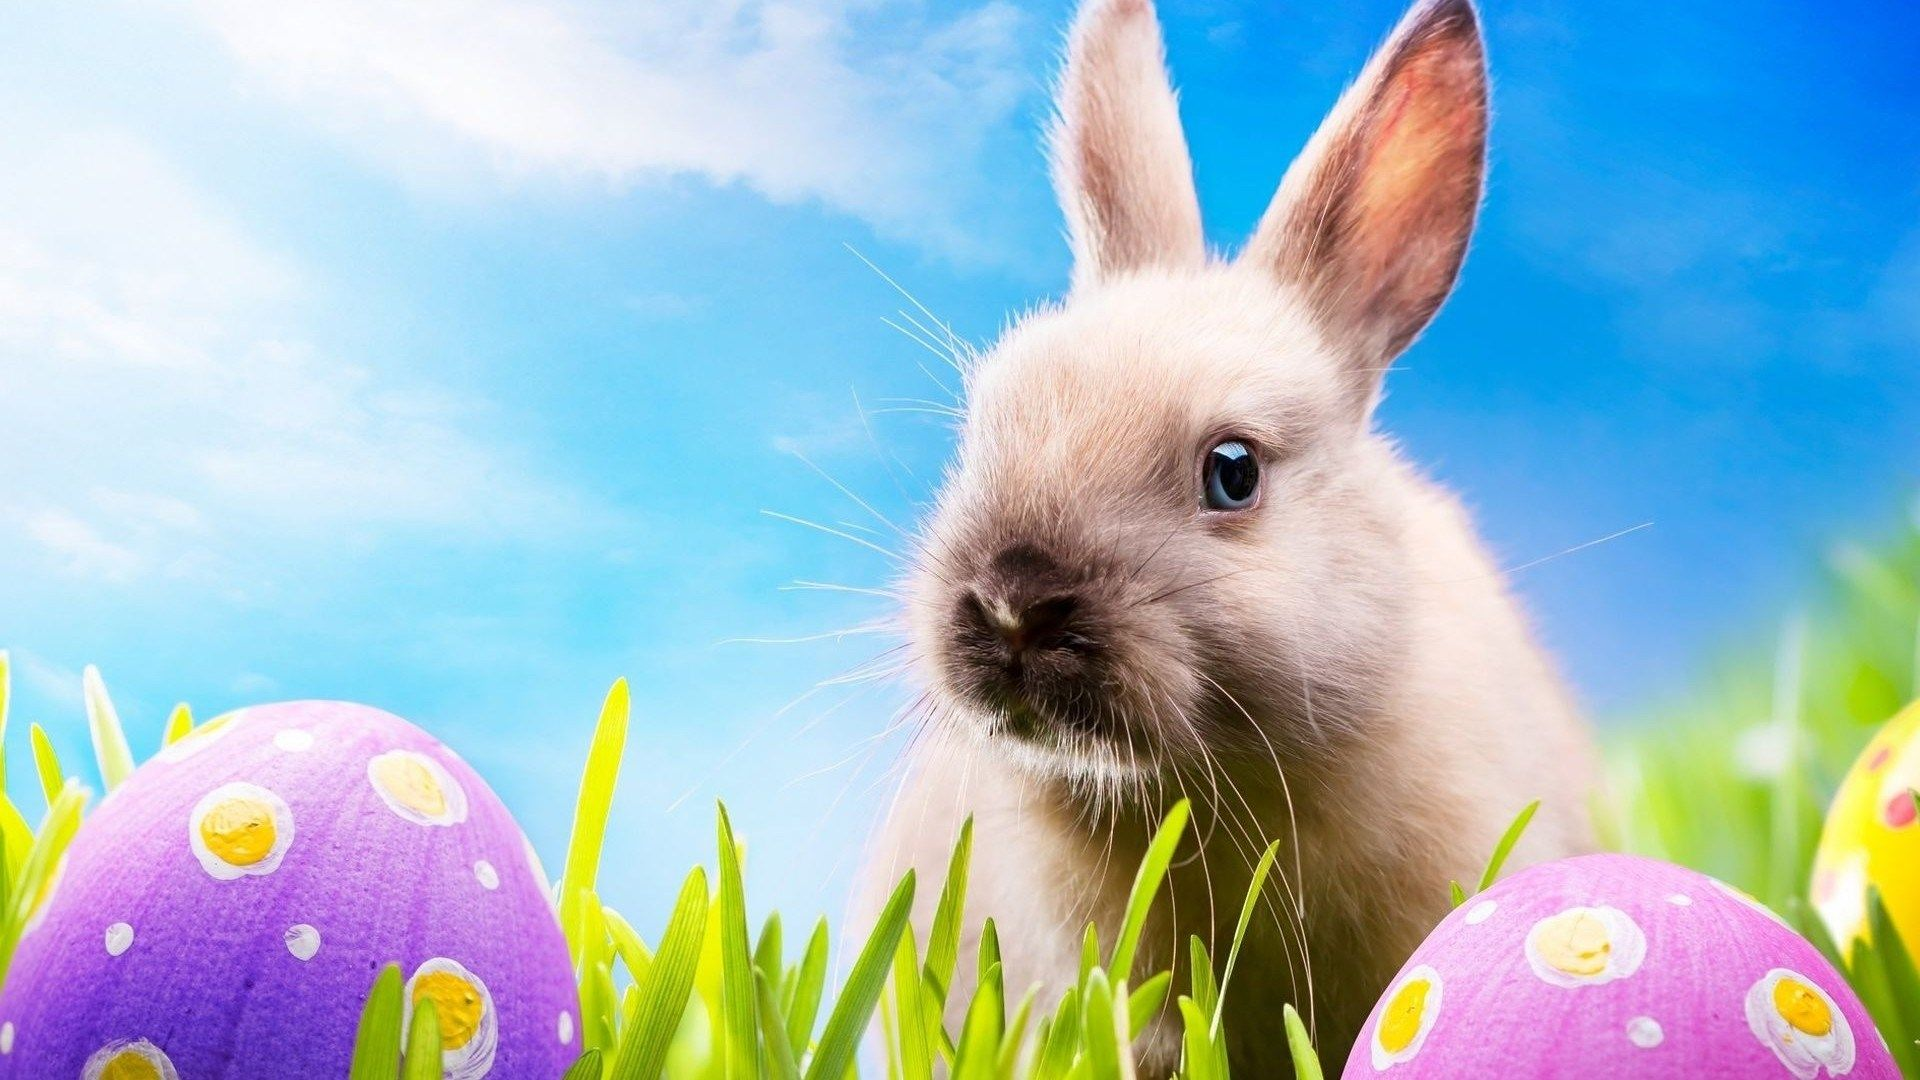 Easter Bunny Desktop Wallpaper 1080p Funny Easter Bunny Easter Wallpaper Easter Bunny Images